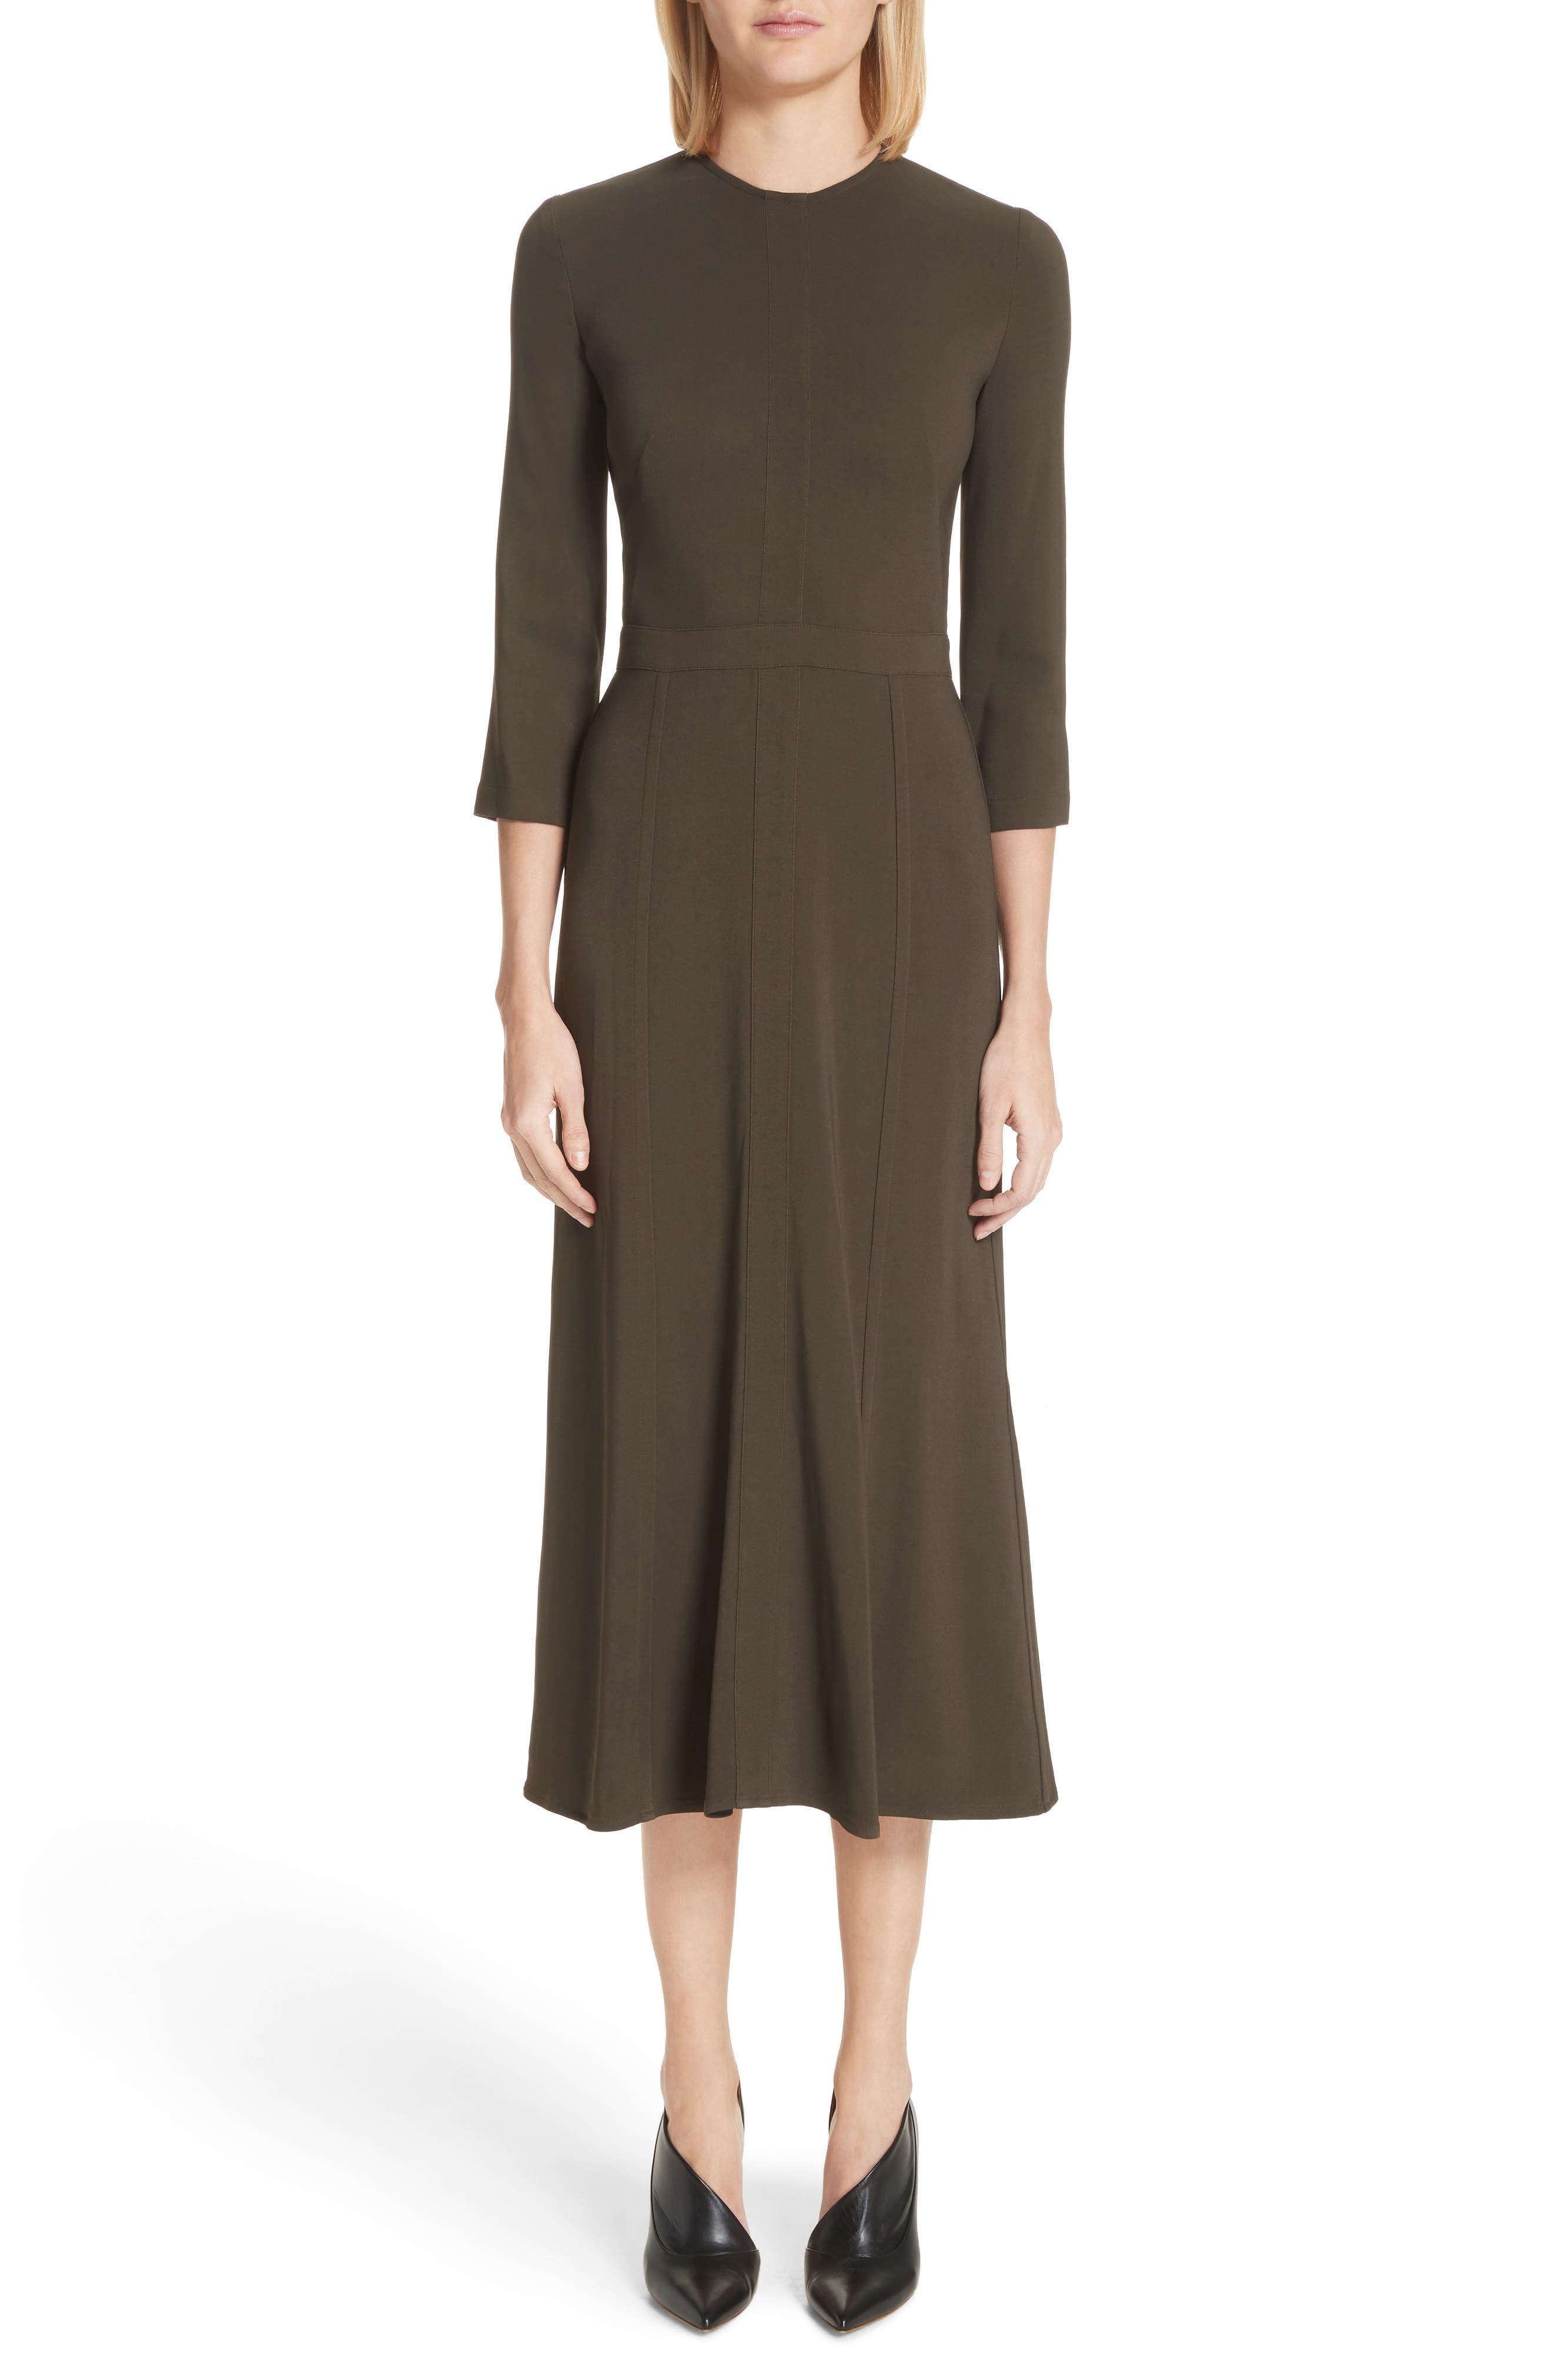 Victoria Beckham Paneled Cady Midi Dress